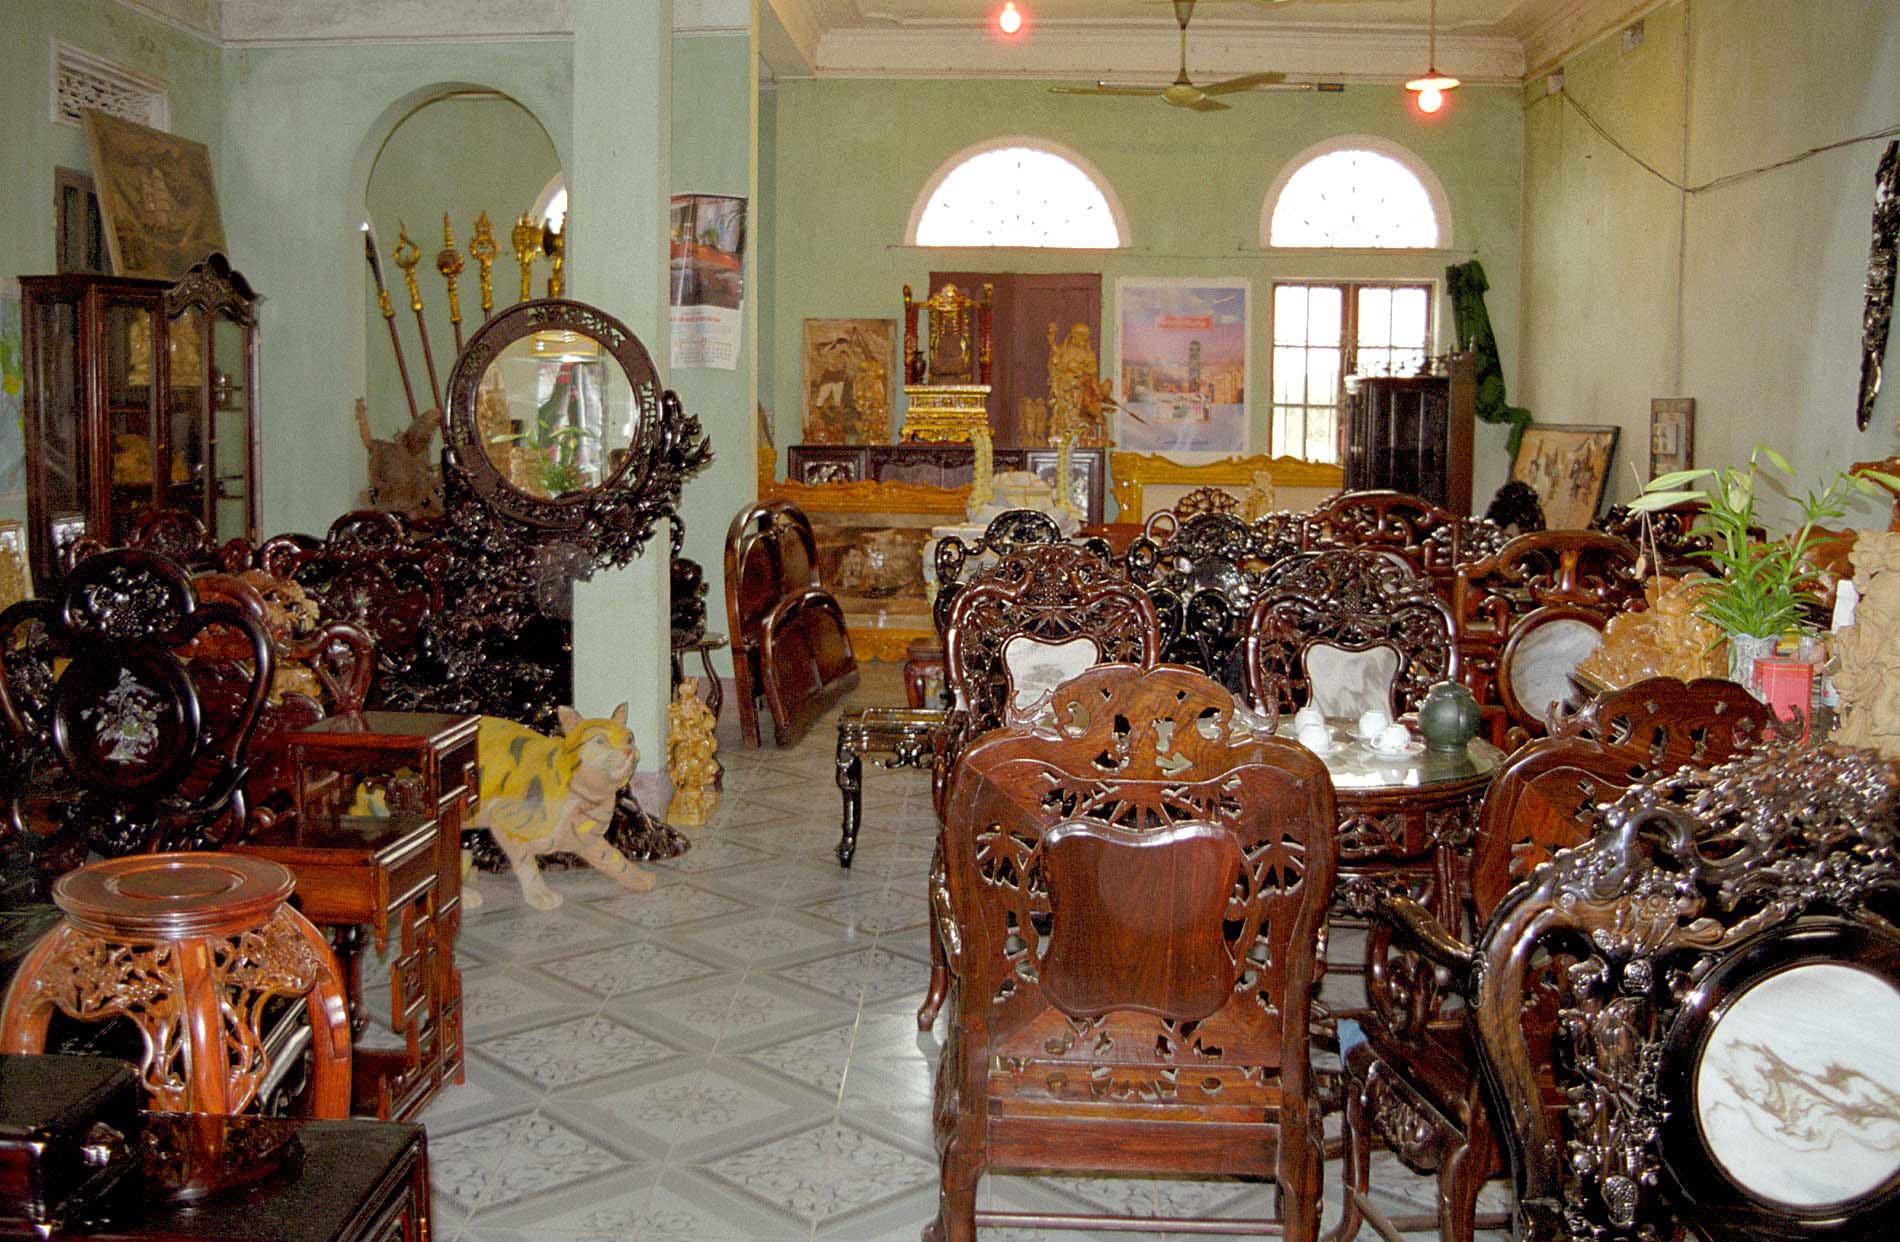 Template for Vietnam furniture